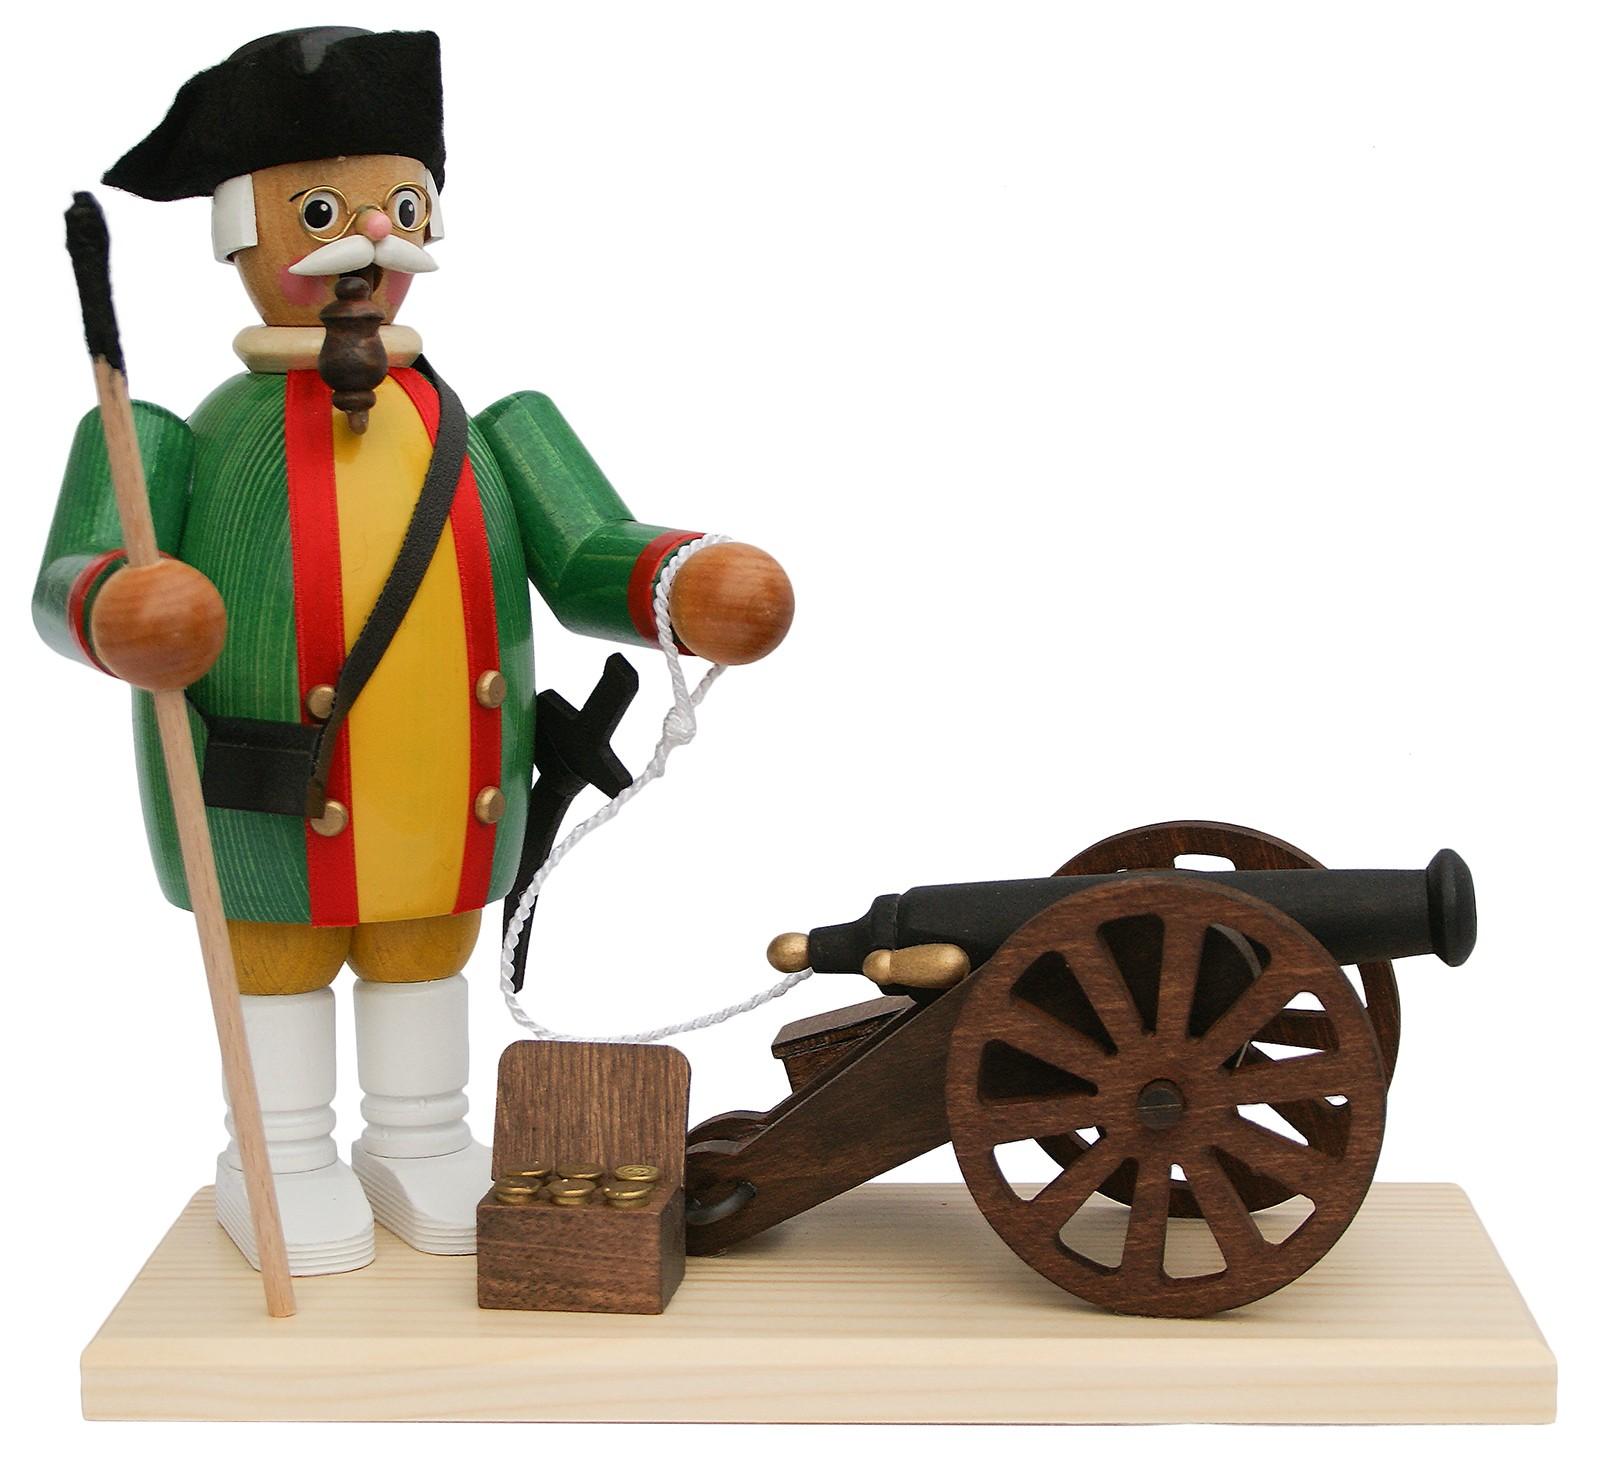 Räuchermann Kanonier mit Kanone